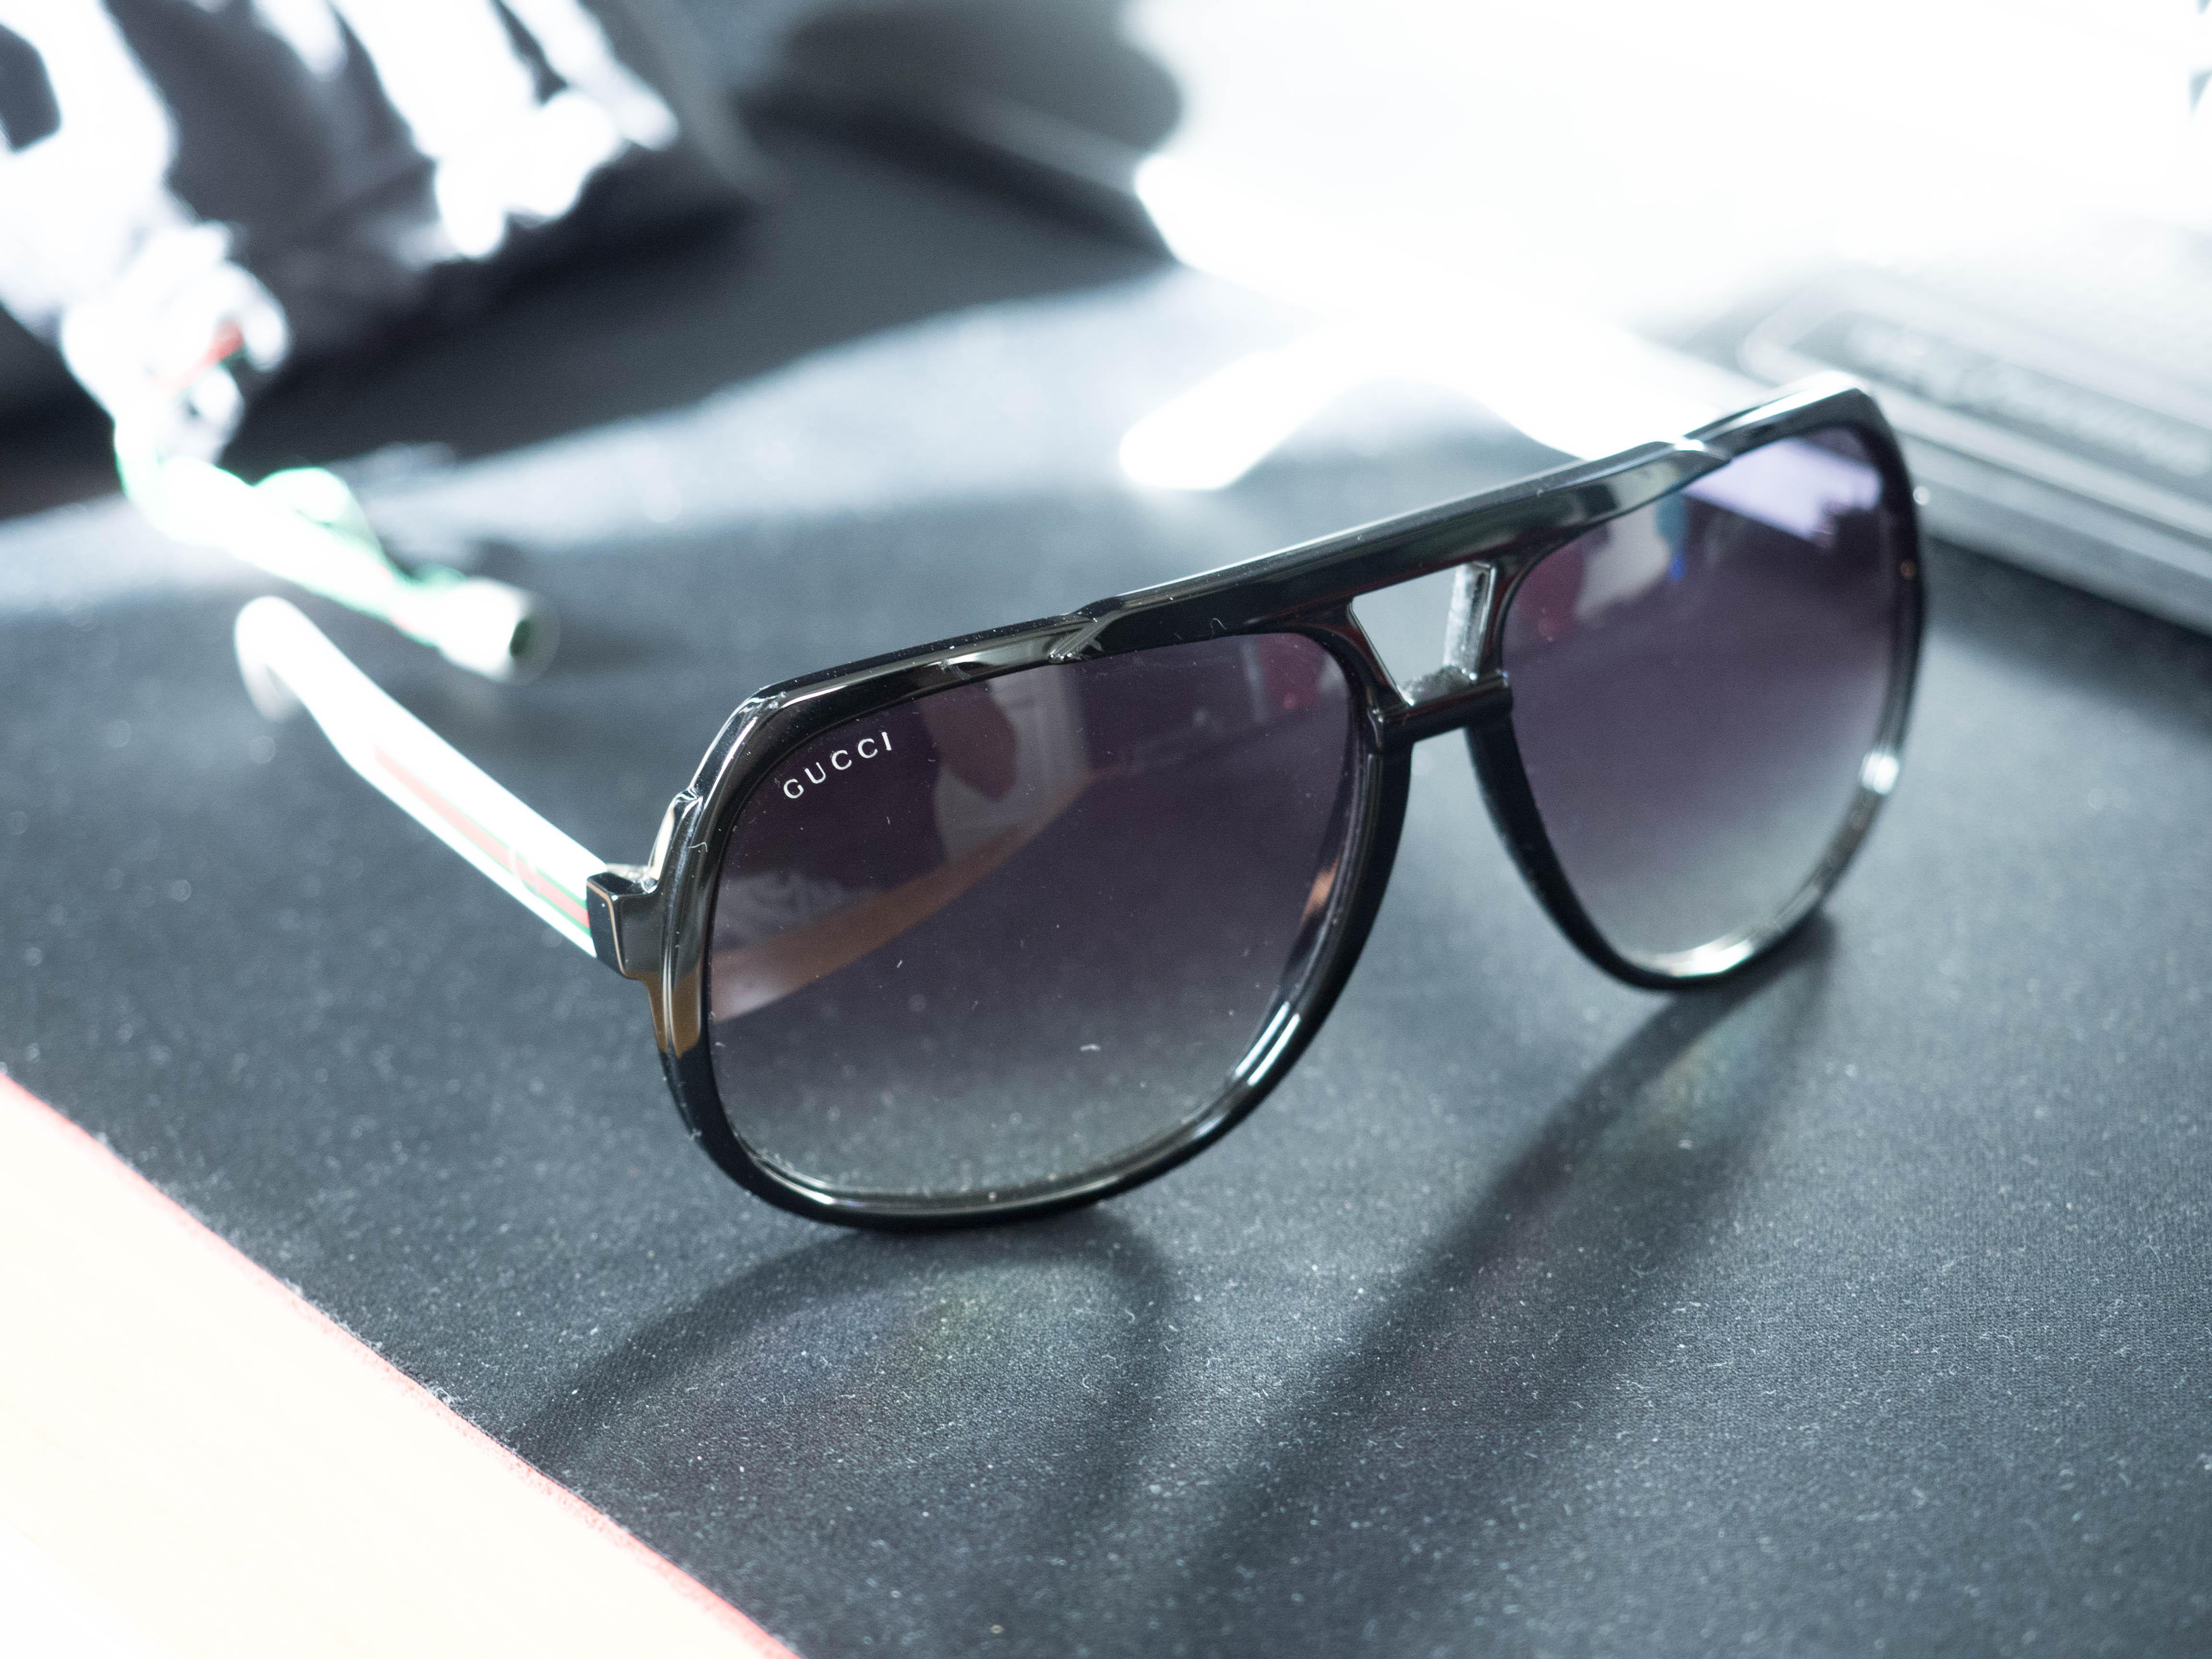 eb91c2278b277 Gucci GG 1622 S Aviator Size one size - Sunglasses for Sale - Grailed